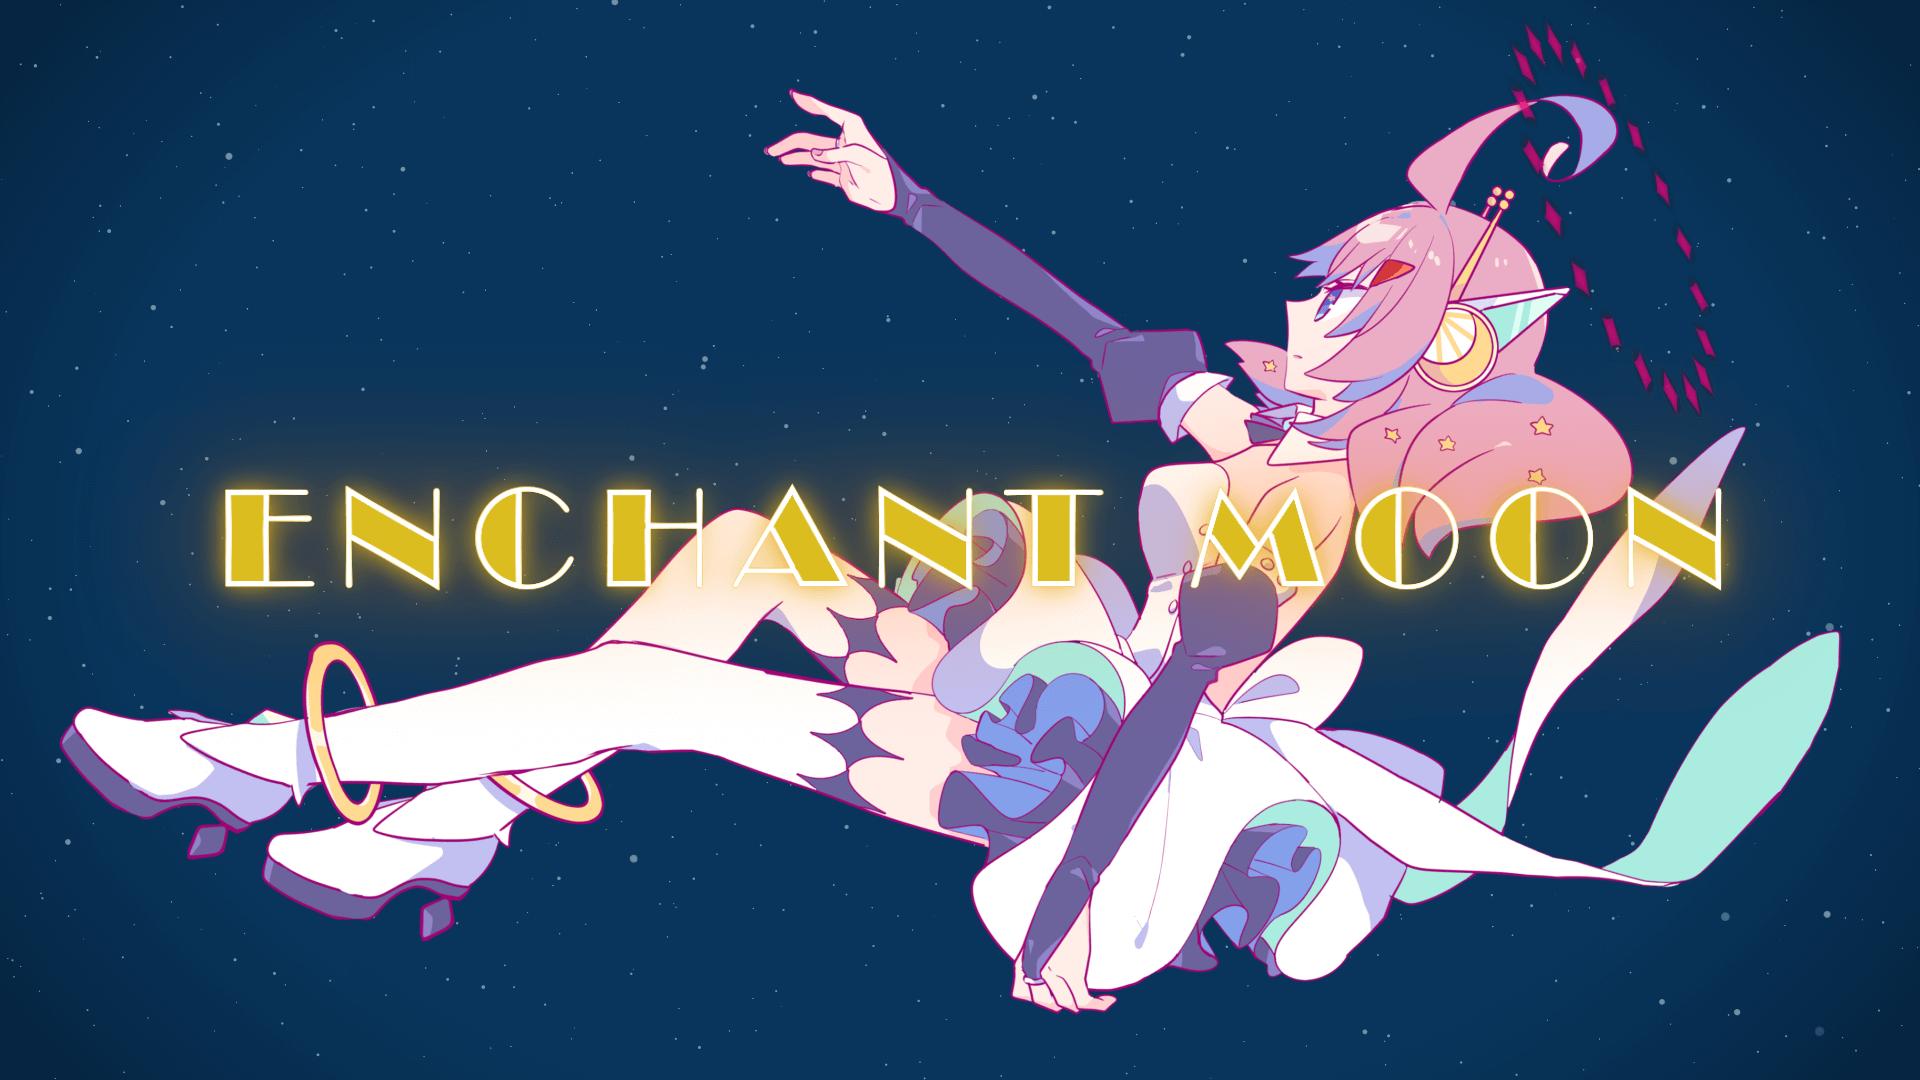 Enchant_moon